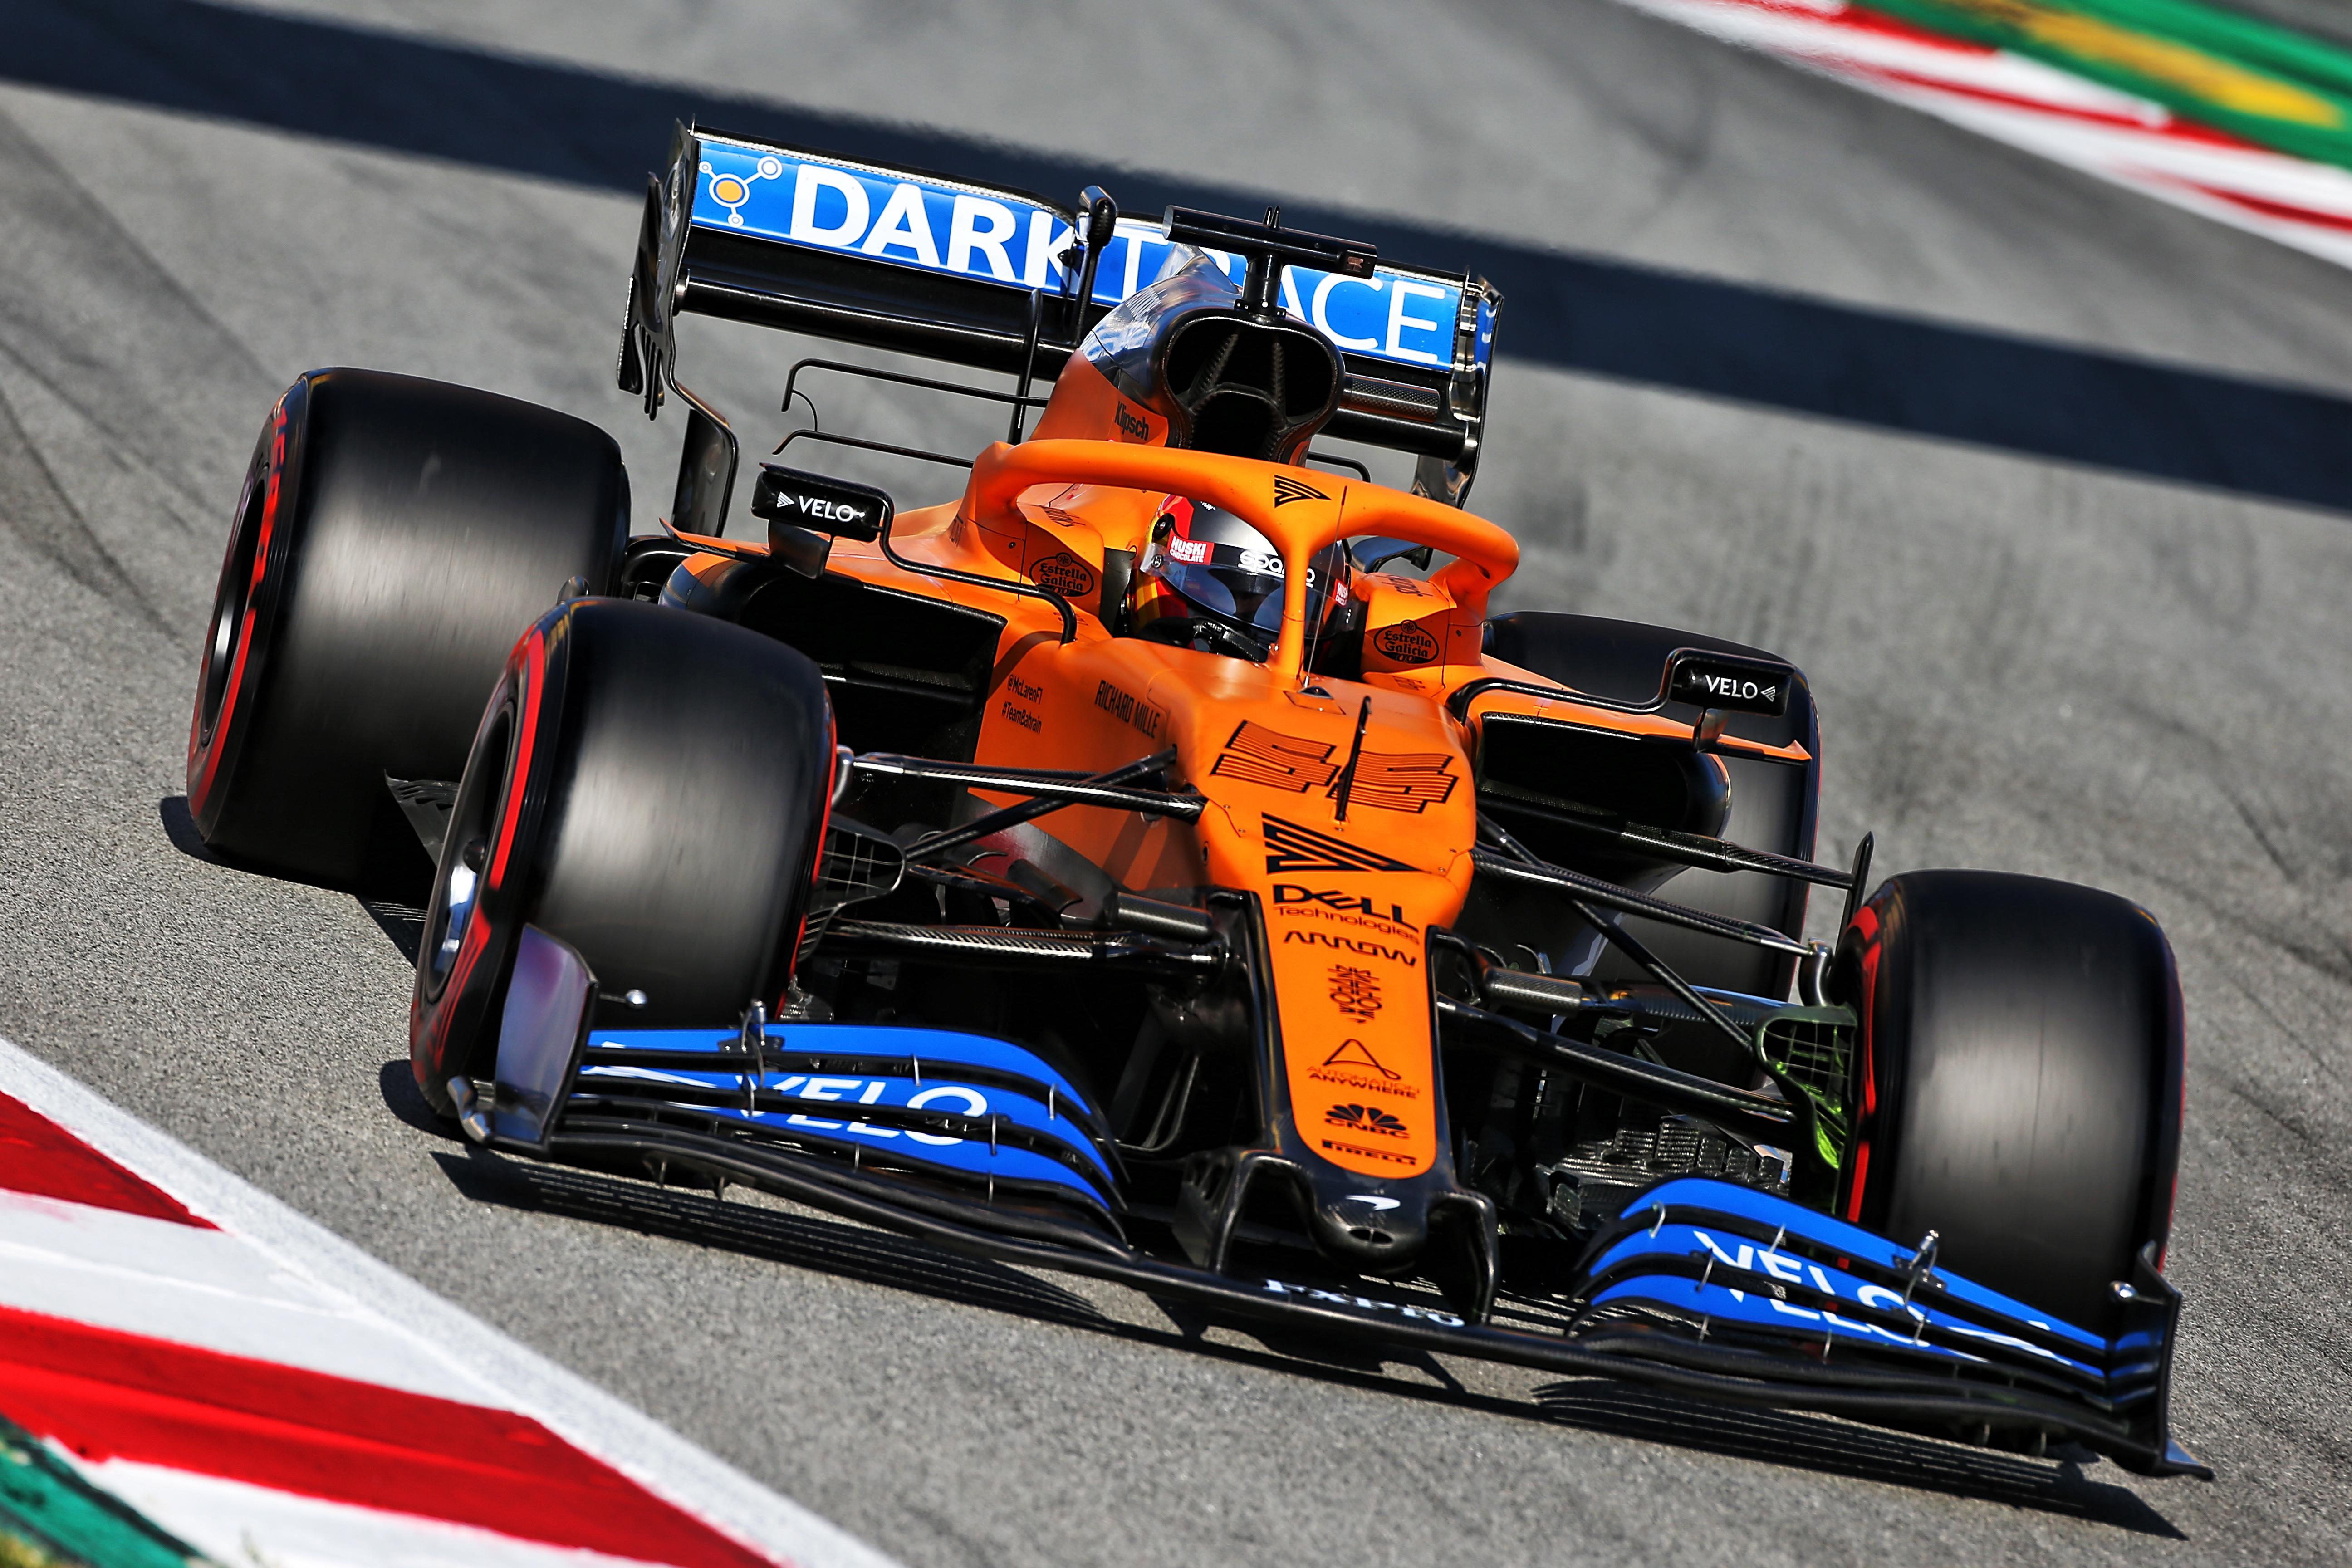 Carlos Sainz Jr McLaren Barcelona F1 testing 2020